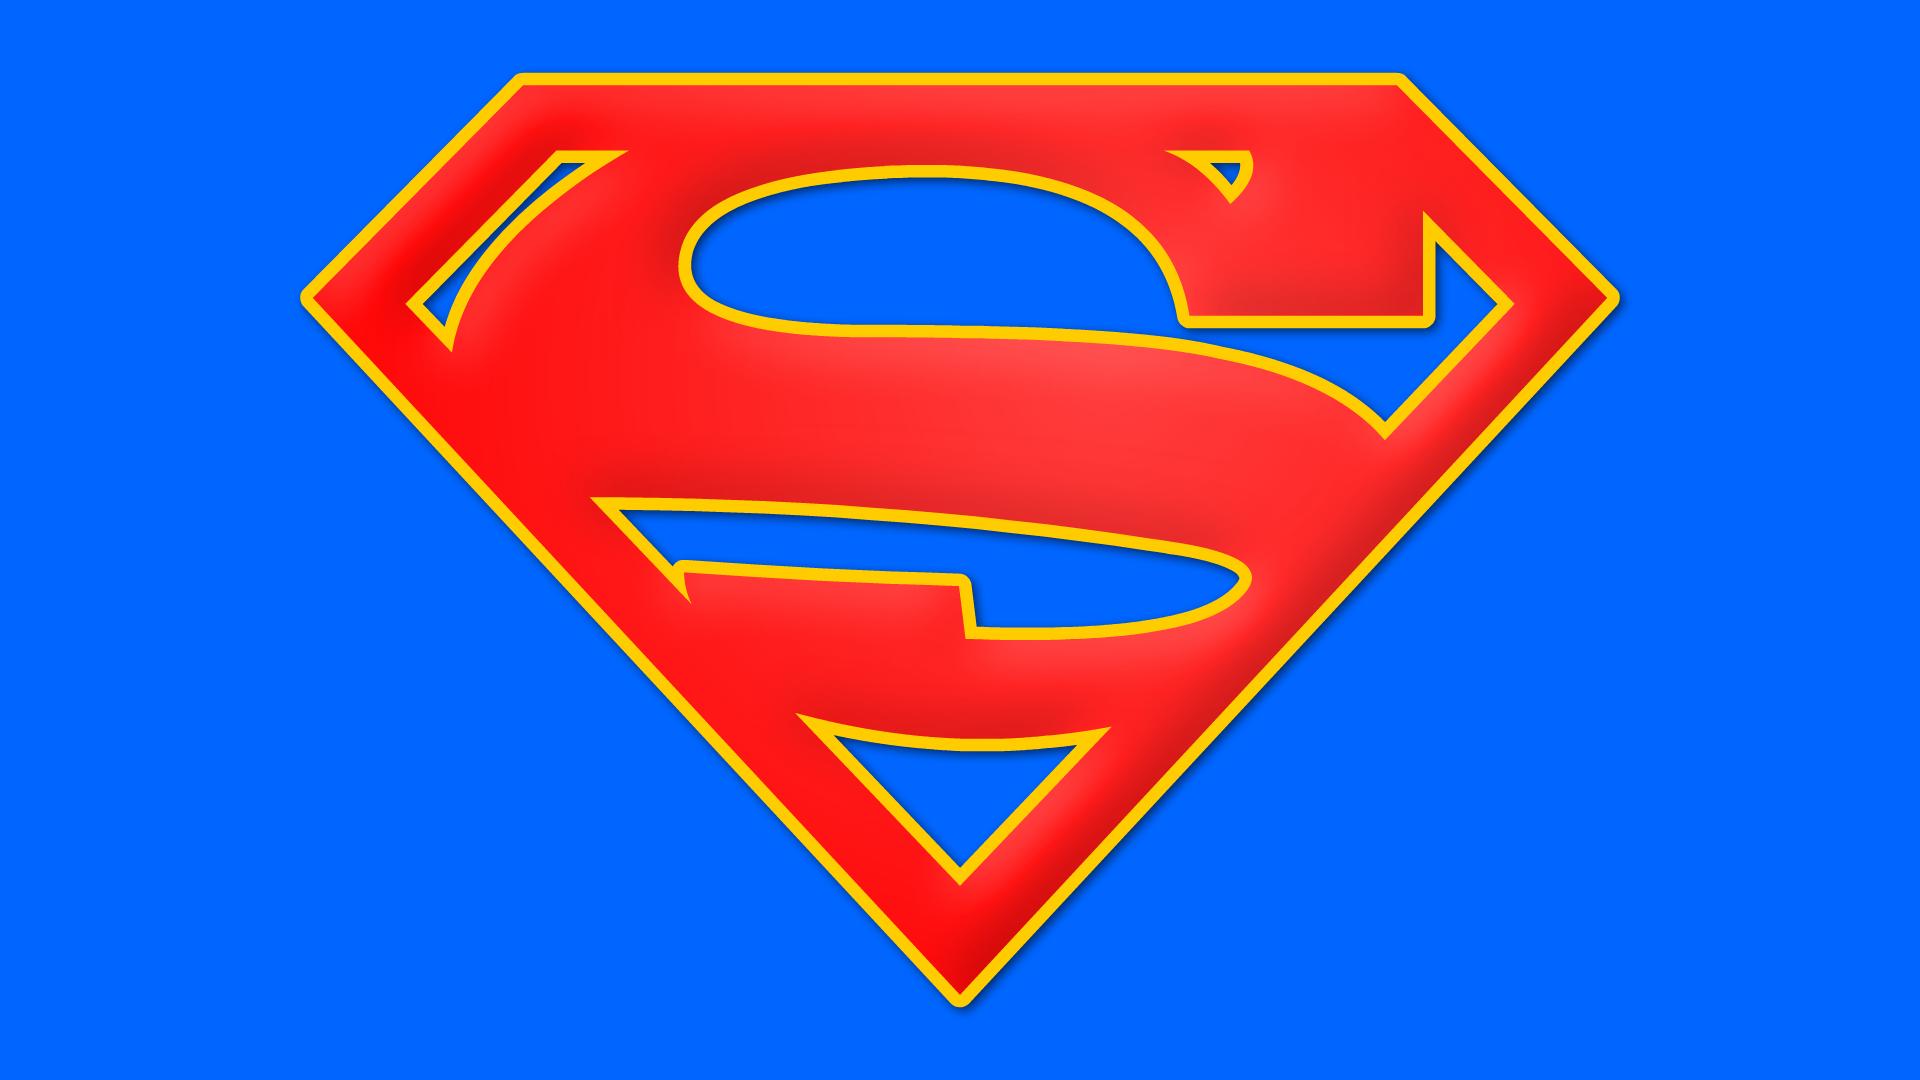 supergirl symbol by yurtigo on deviantart